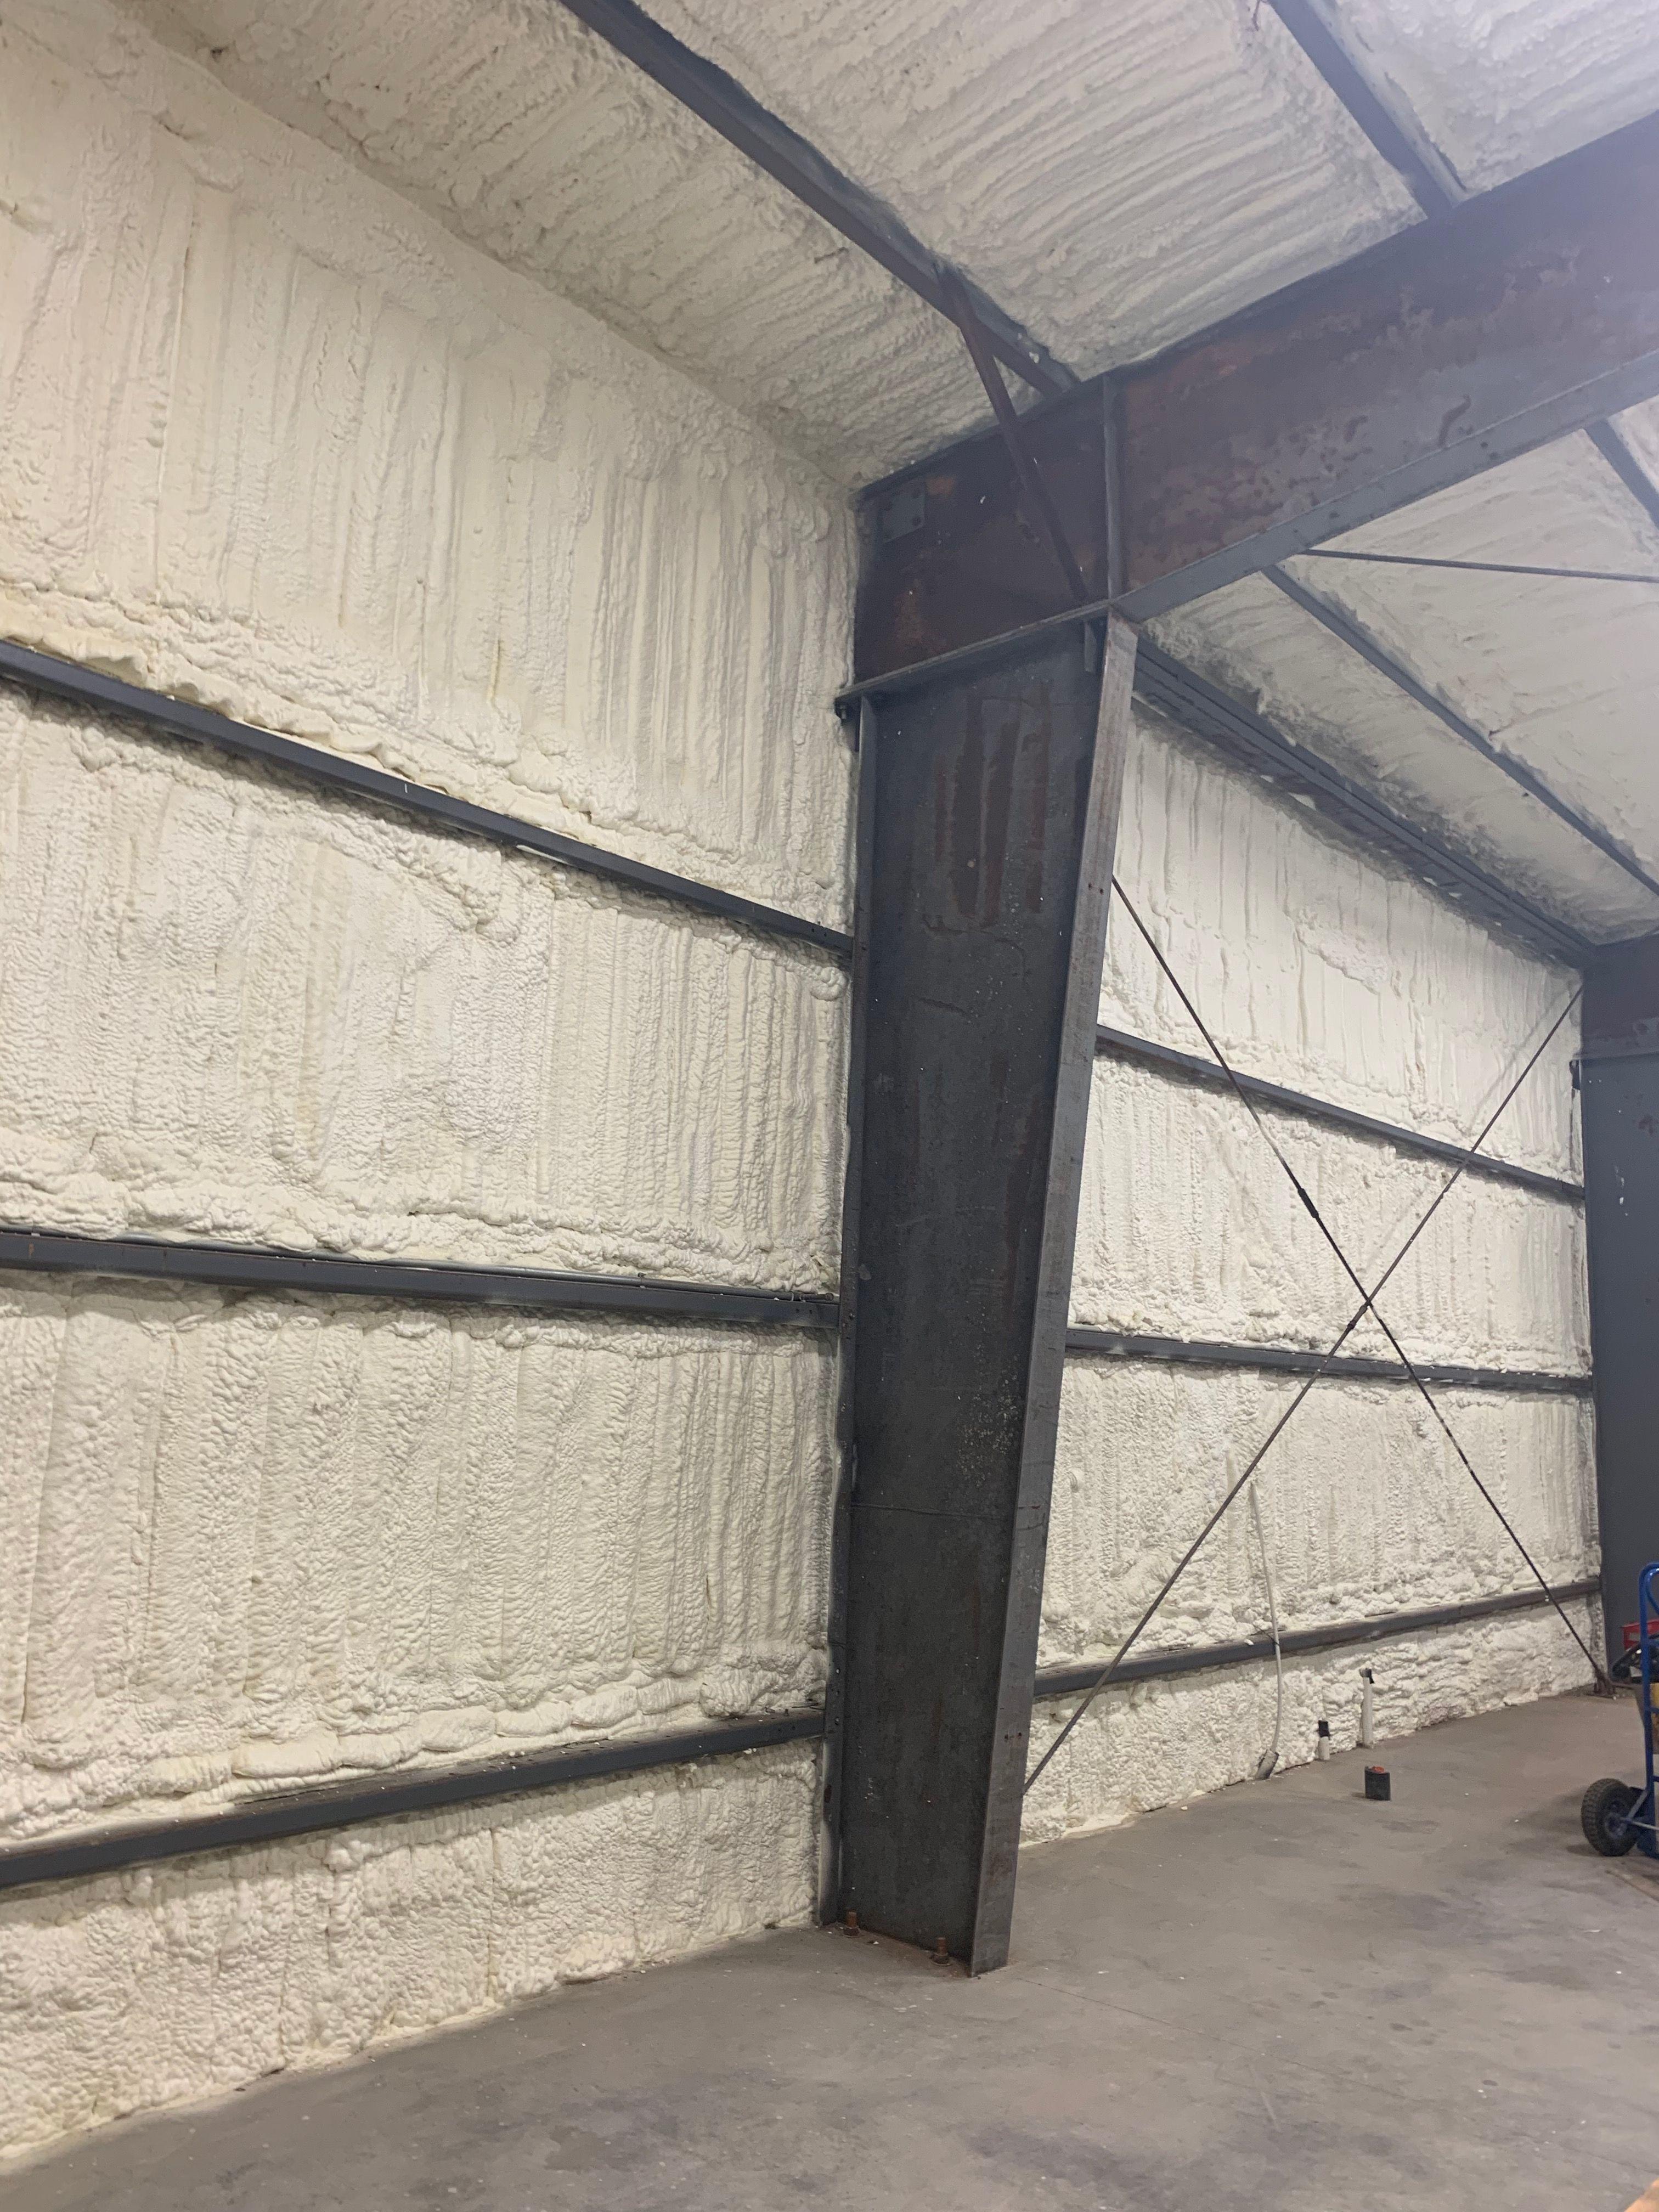 Spray Foam Insulation On Metal Building Metal Buildings Spray Foam Insulation Metal Building Insulation